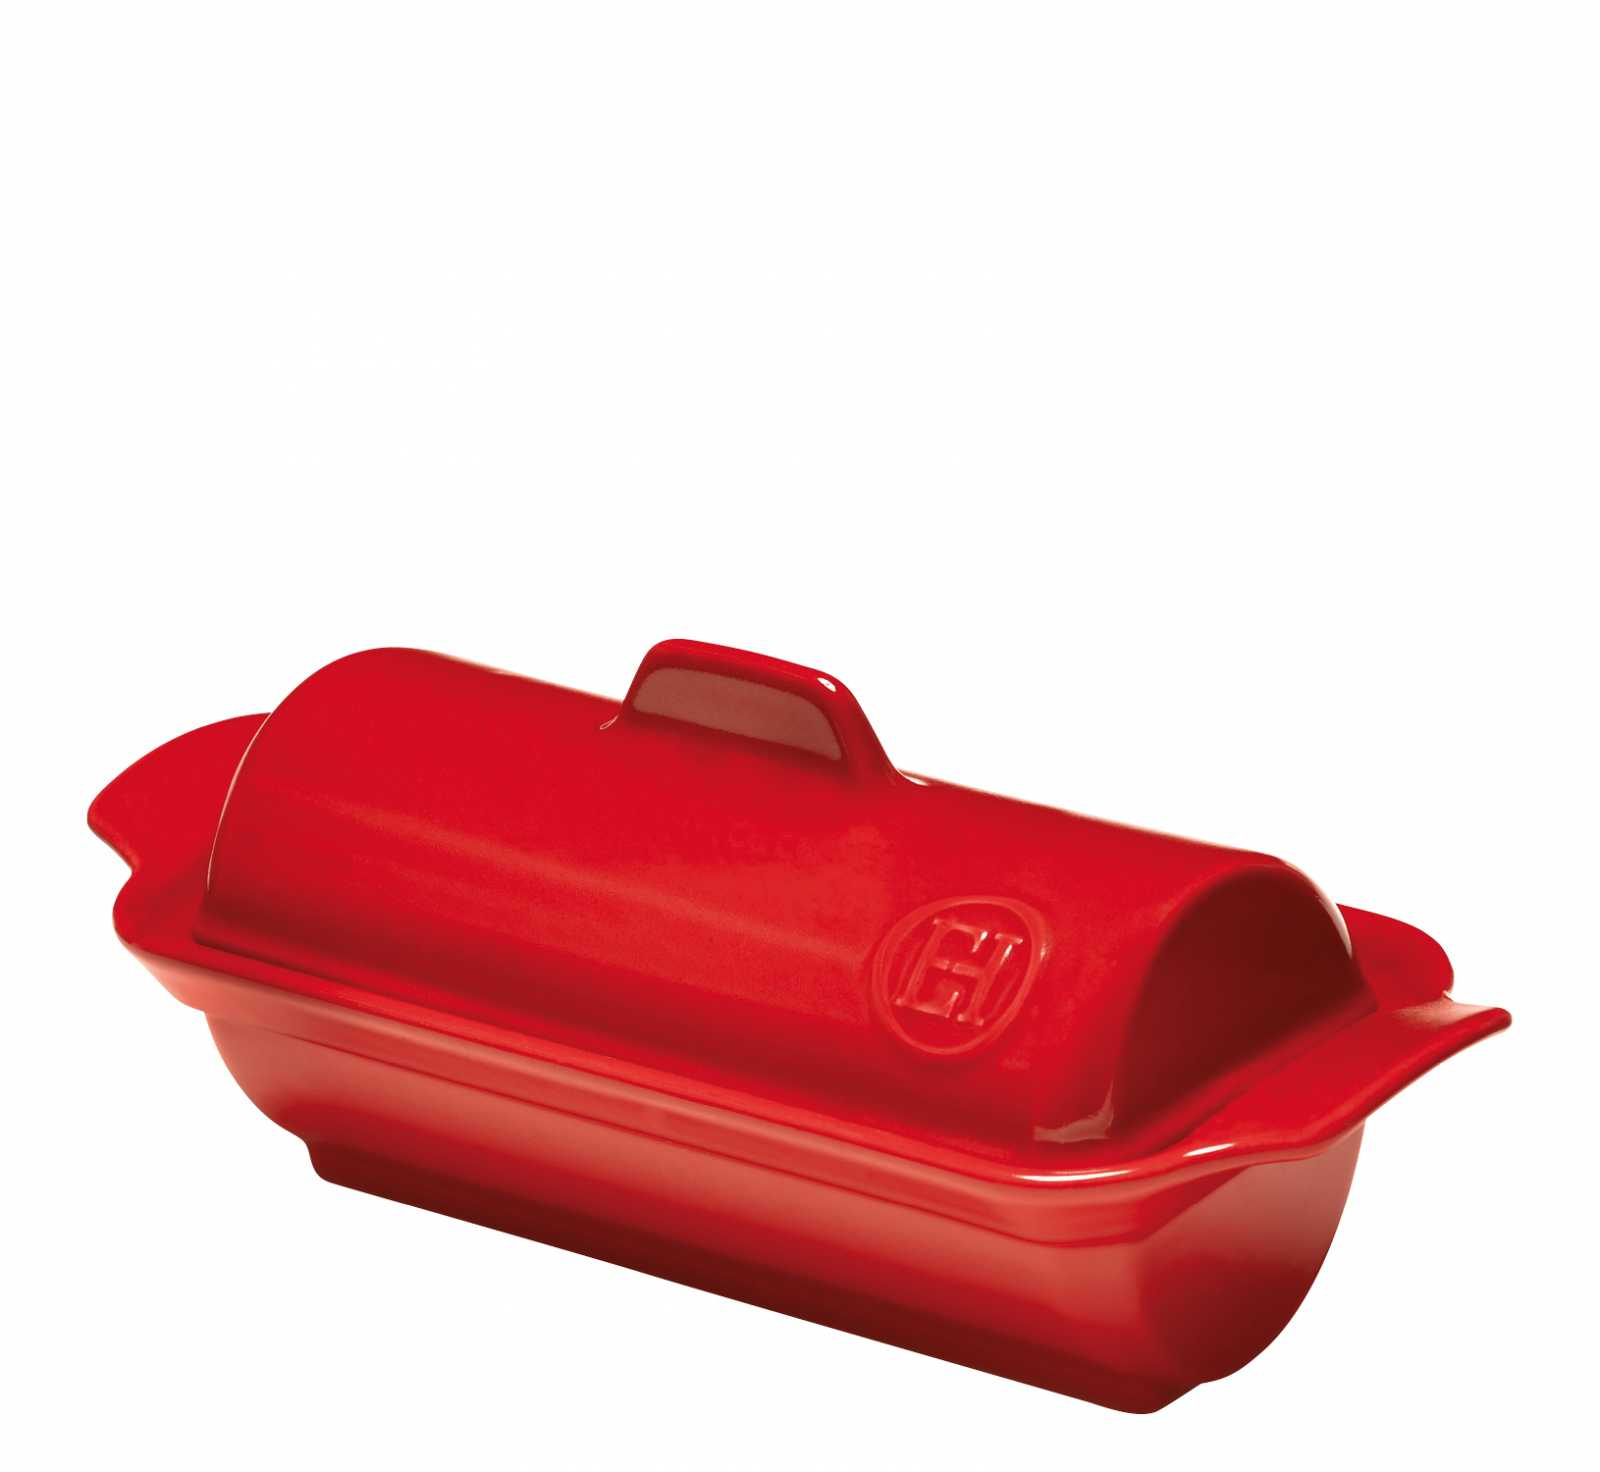 Онлайн каталог PROMENU: Форма для фуа-гра Emile Henry, 24,5x10,5 см, красный                               345865